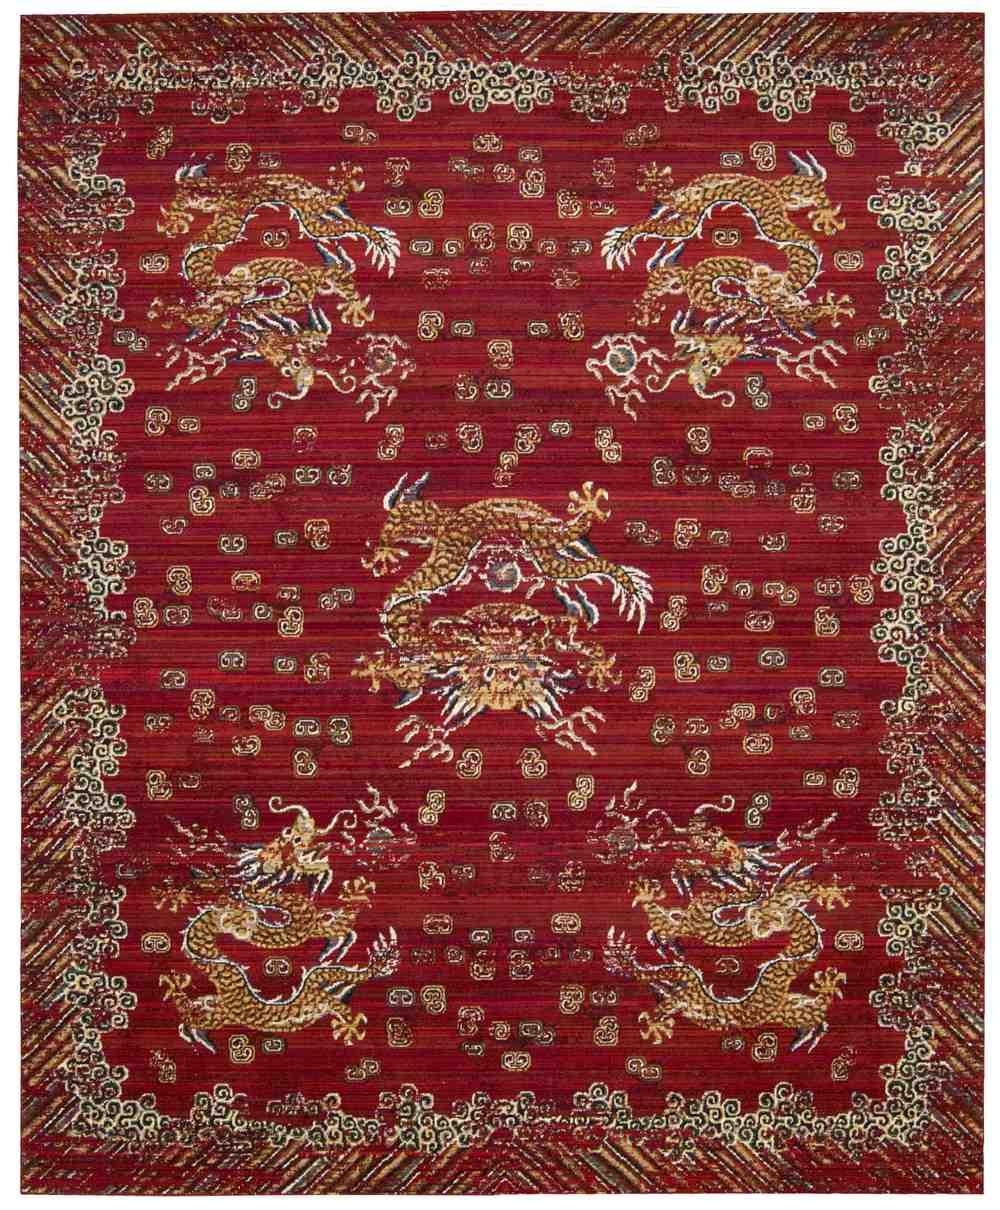 nourison barclay butera dynasty dyn04 oxblood area rug | free shipping